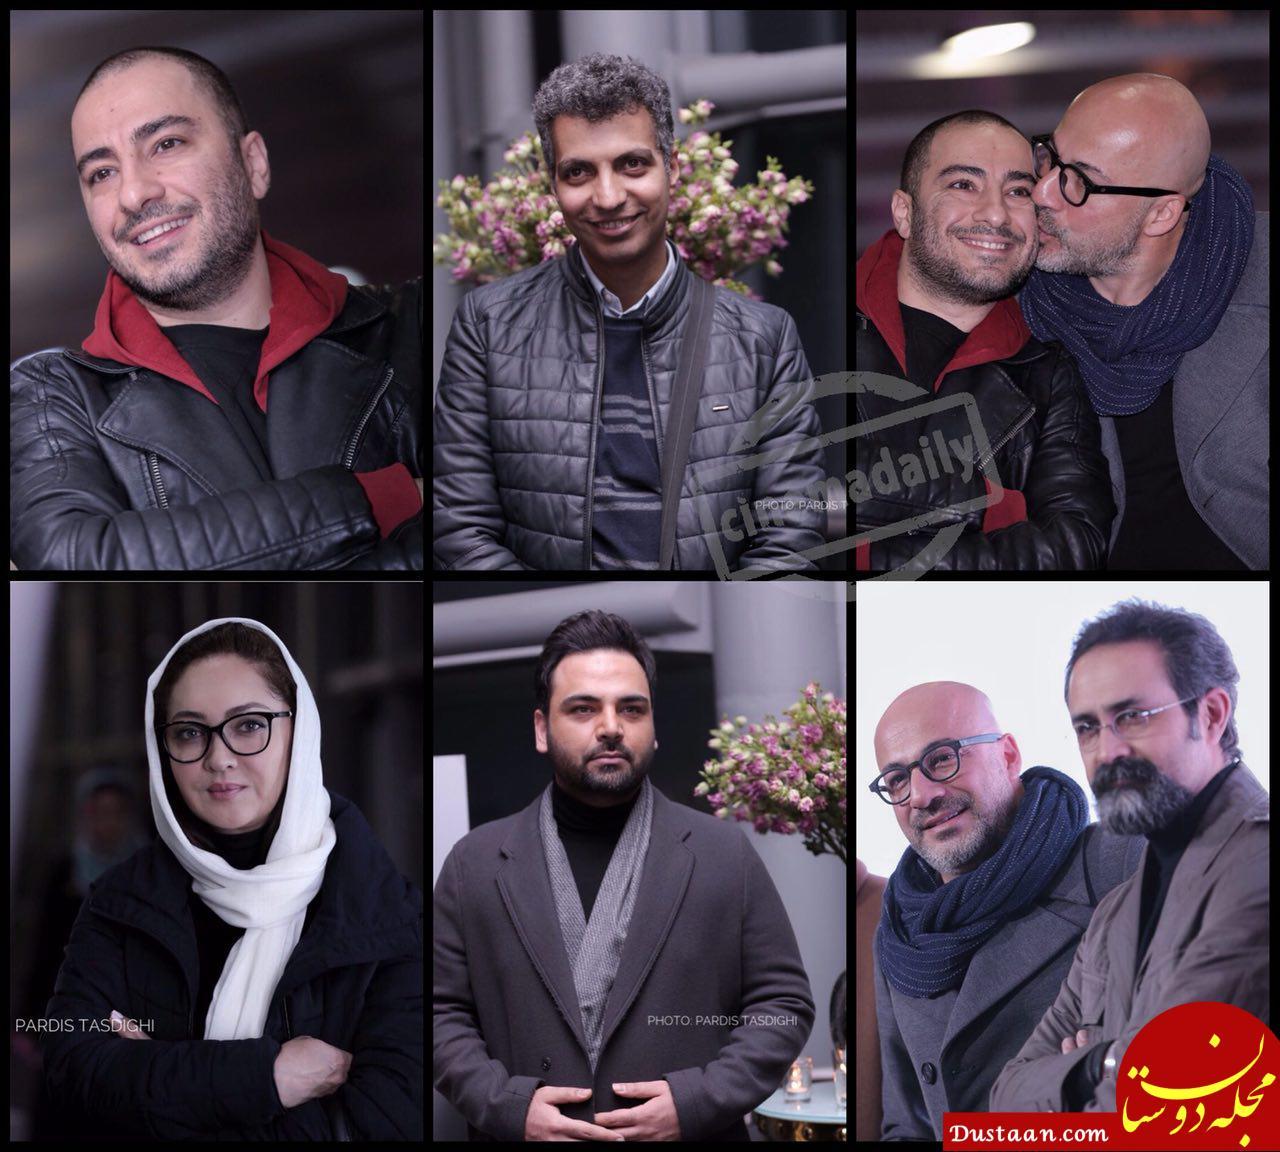 www.dustaan.com ستاره های سینما در اکران خصوصی «بدون تاریخ بدون امضا» +عکس